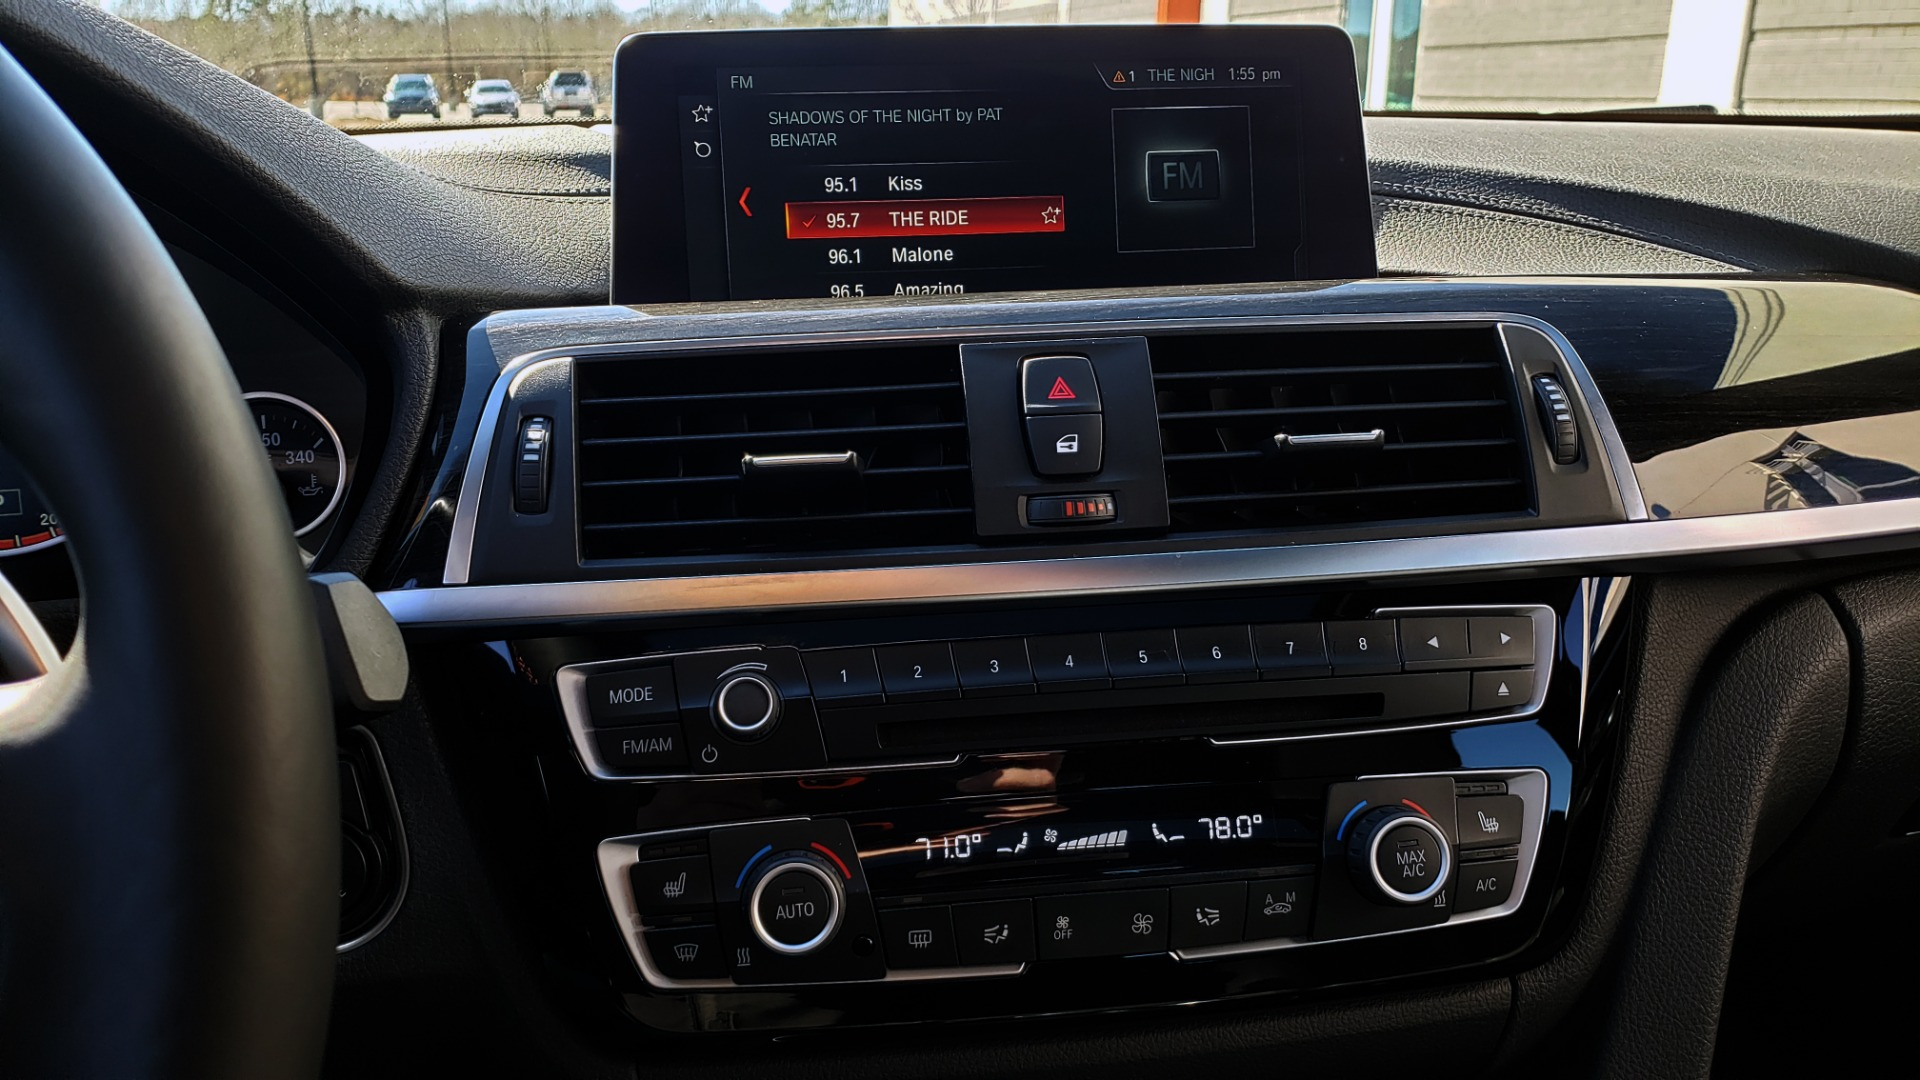 Used 2018 BMW 4 SERIES 430IXDRIVE / PREMIUM / NAV / SUNROOF / ESSENTIALS PKG for sale $28,995 at Formula Imports in Charlotte NC 28227 44